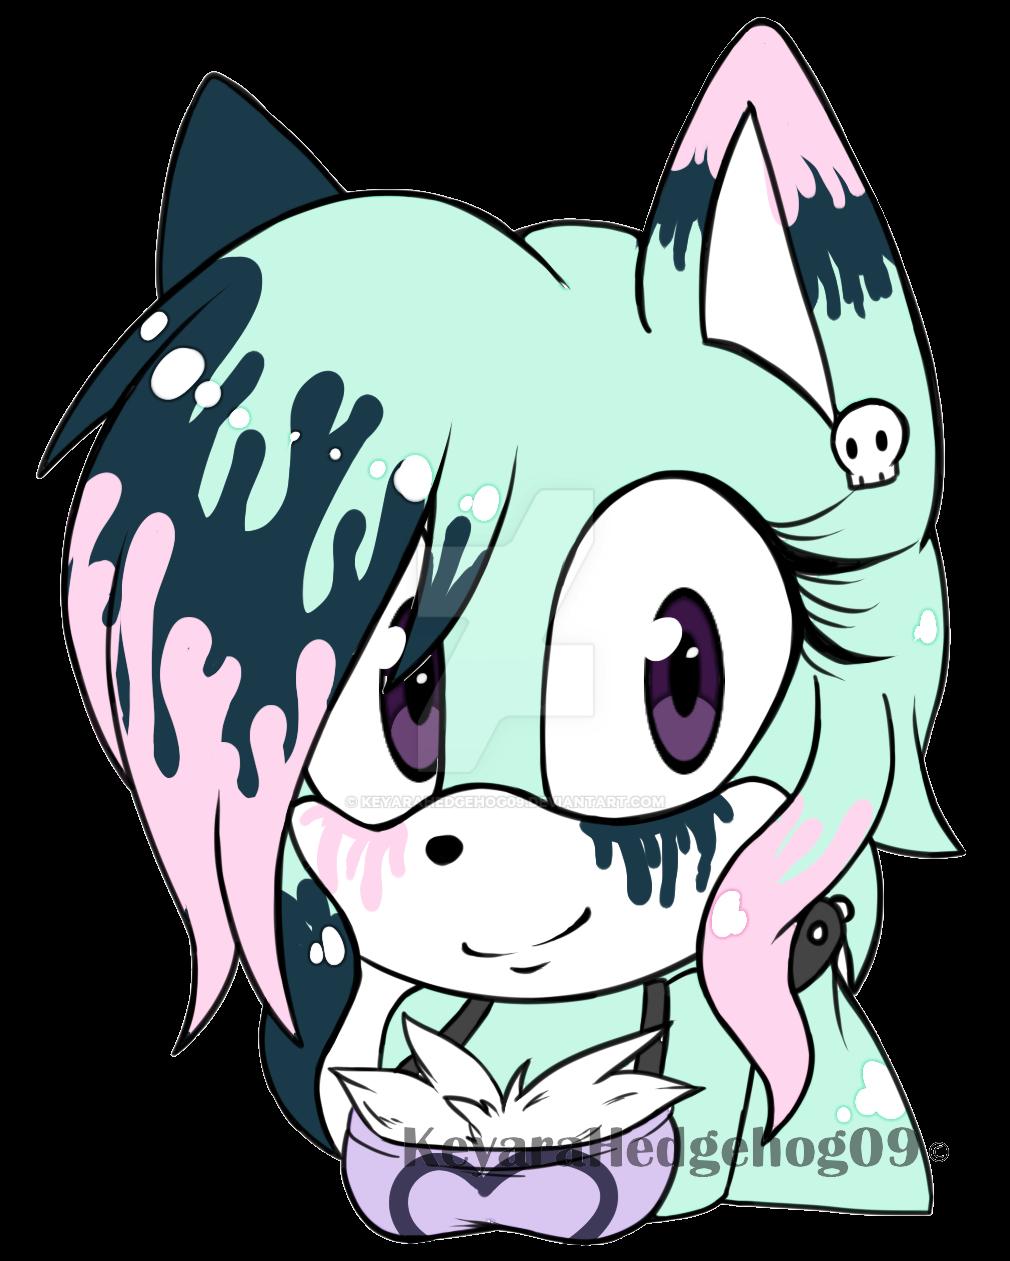 PC paige-the-unicorn by KeyaraHedgehog09